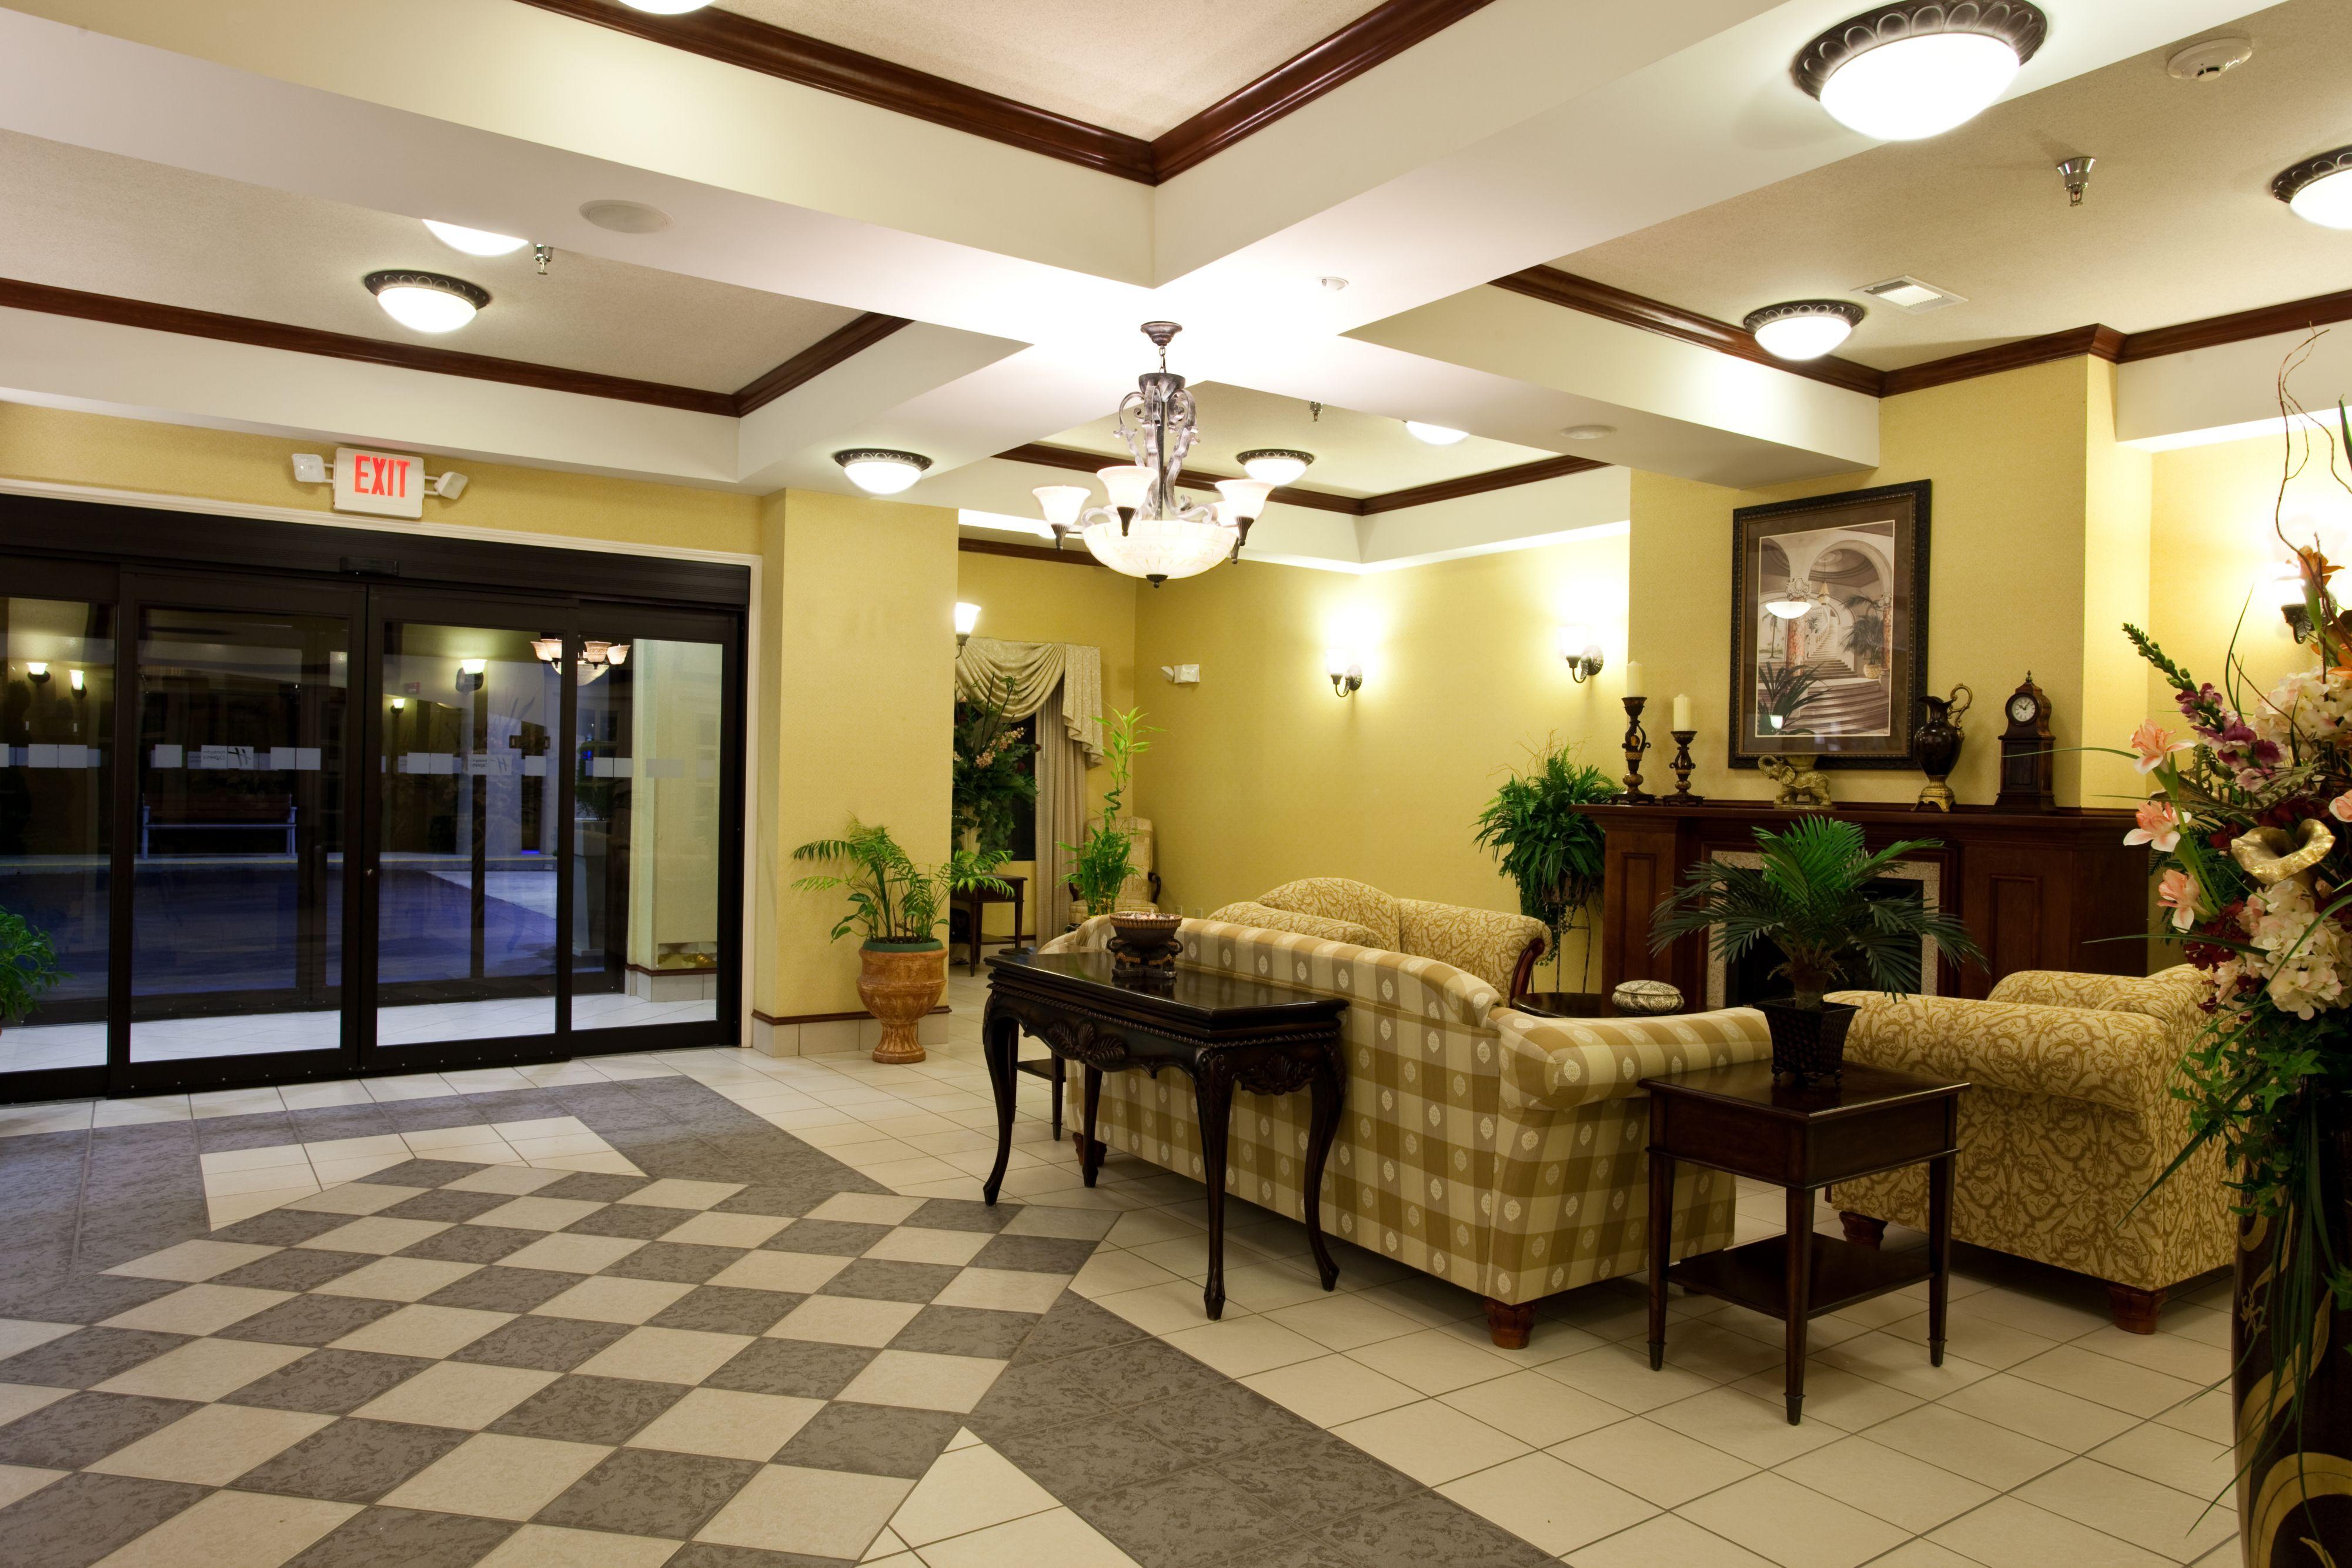 Holiday Inn Express Clanton image 5